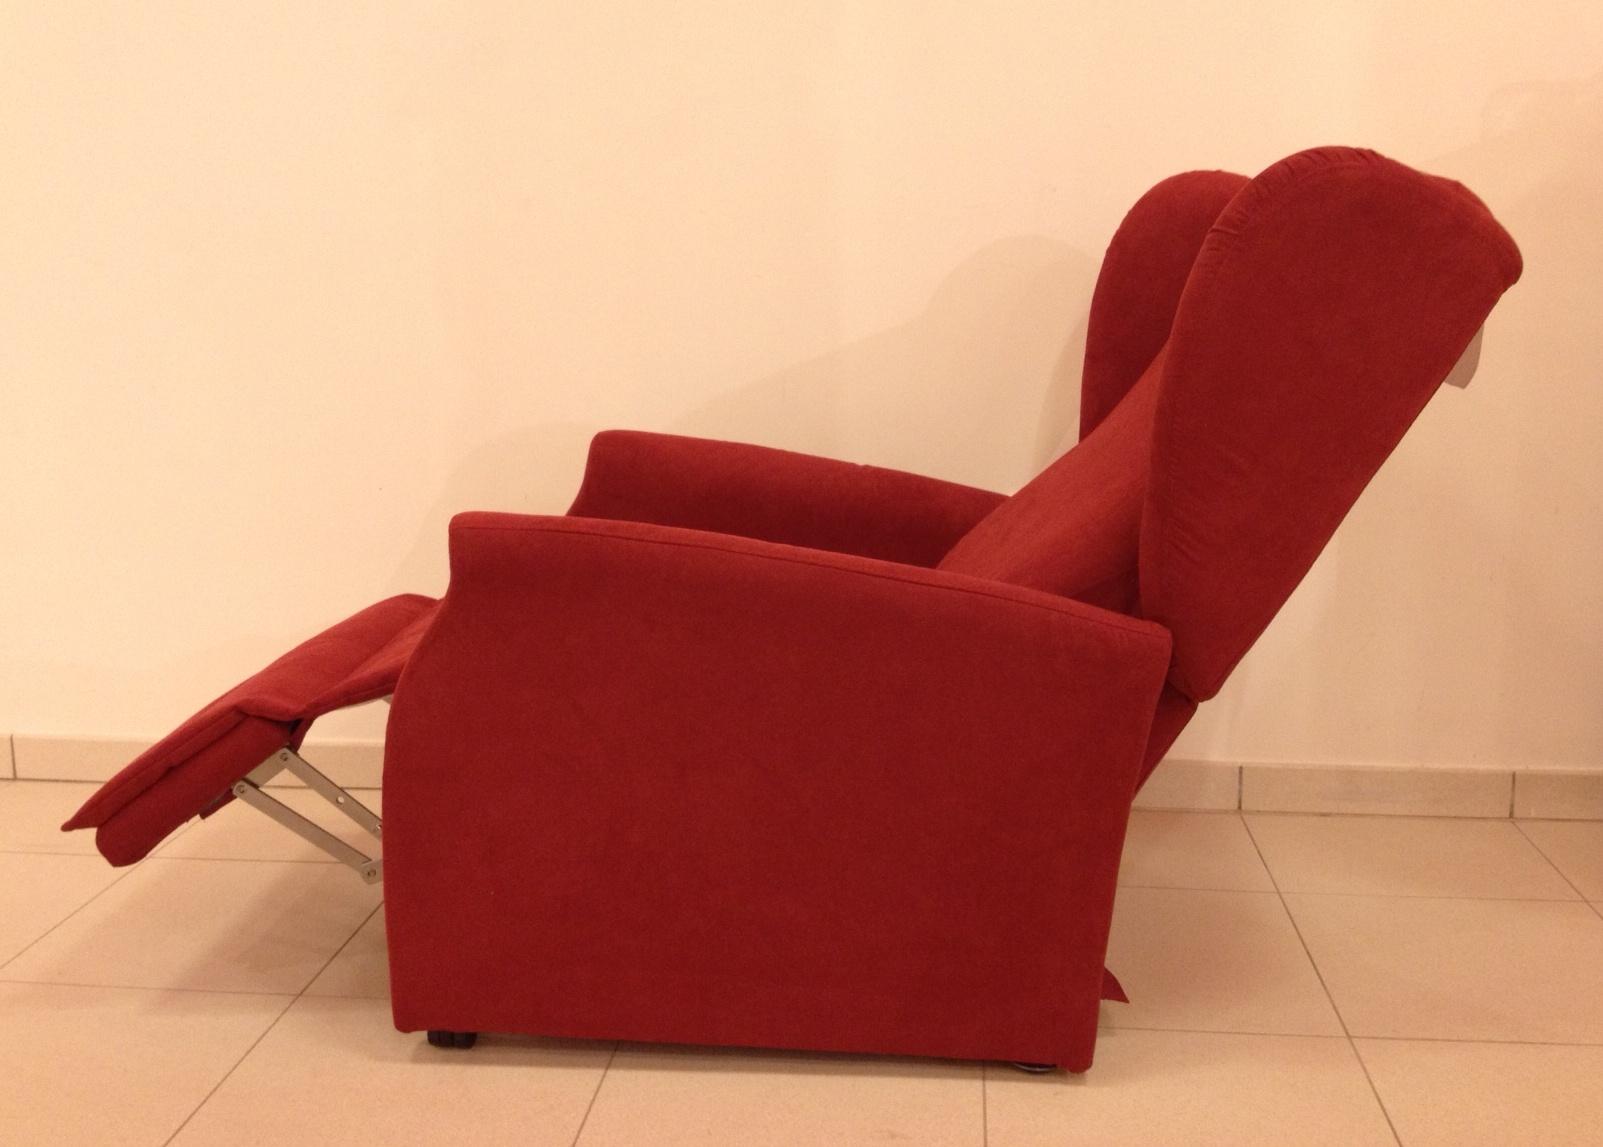 Porta tv a bandiera per angolo - Poltrona reclinabile ikea ...